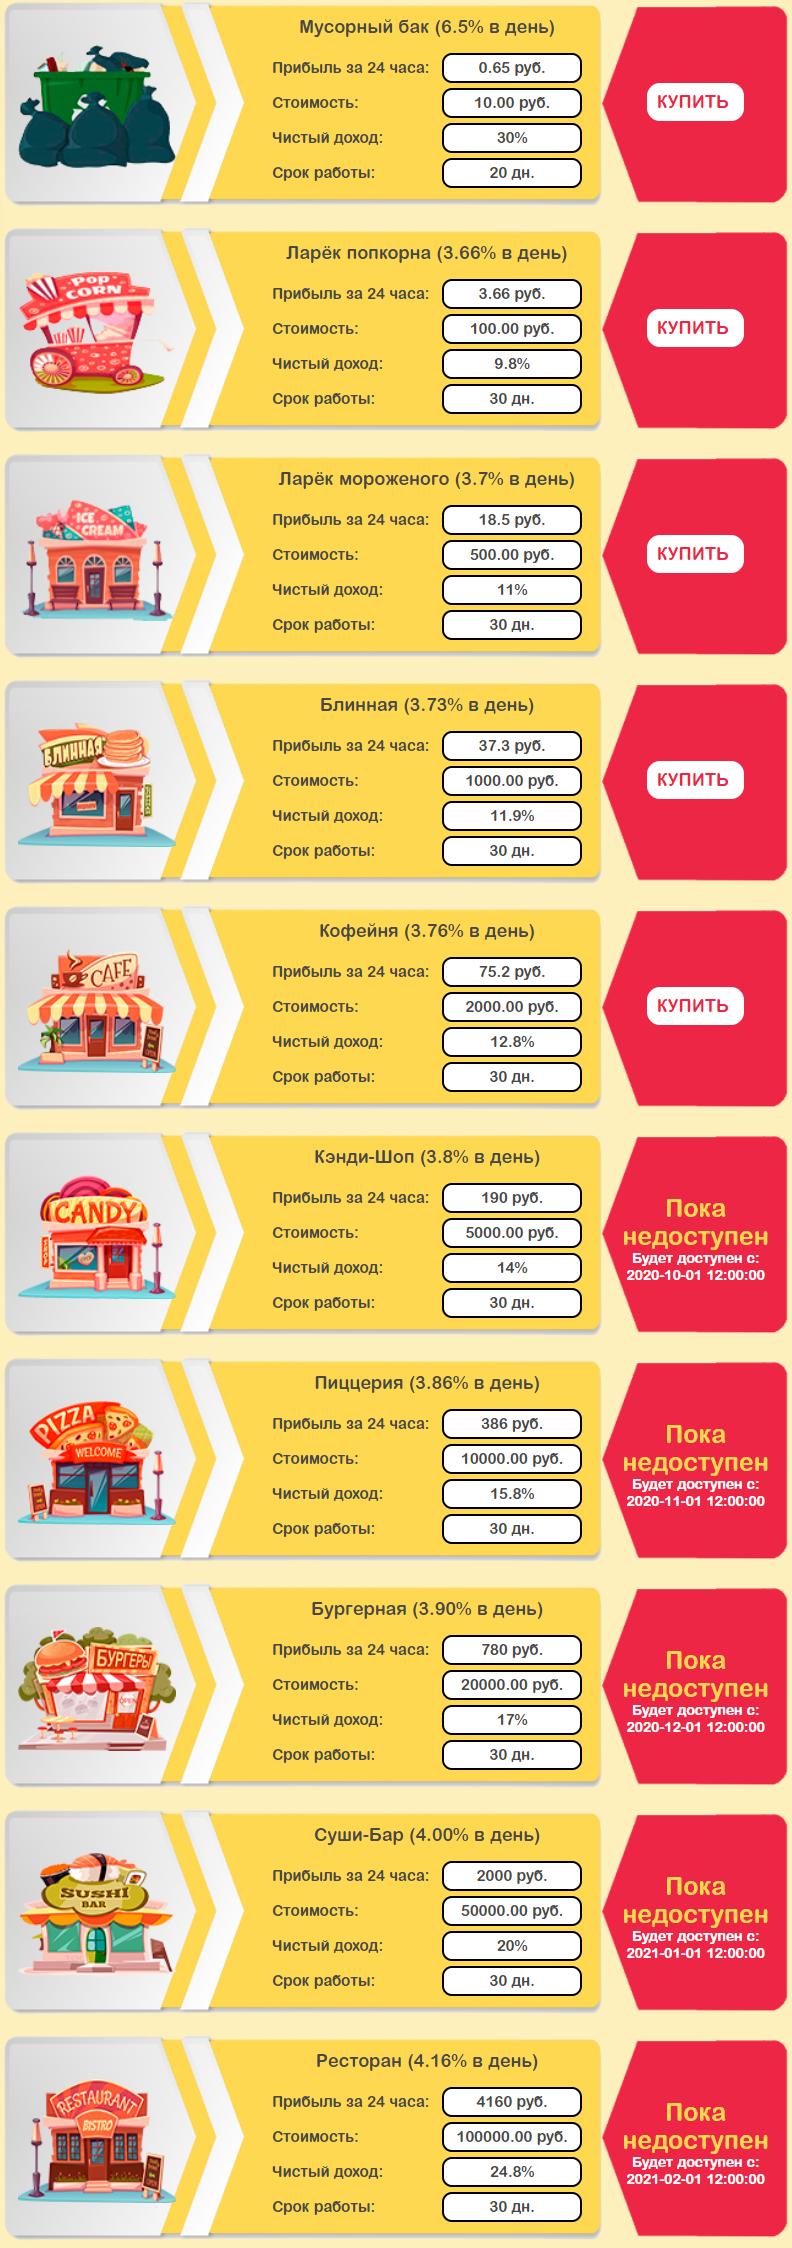 Mealand Biz - Аренда бизнеса - mealand.biz - маркетинг игры